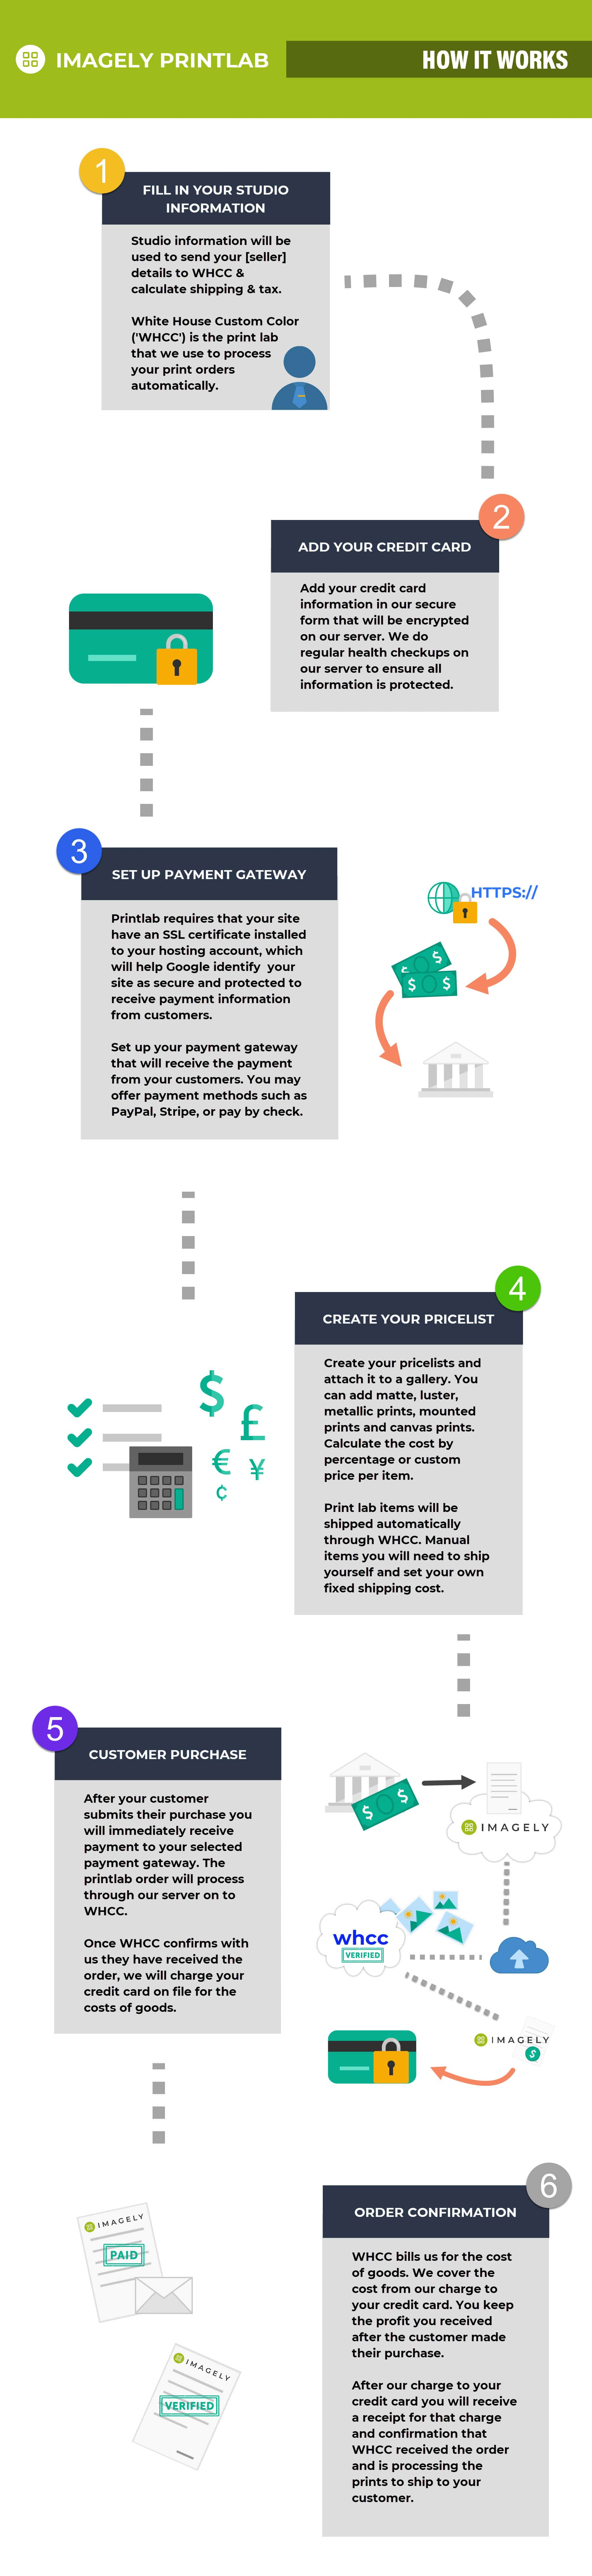 Printlab Overview